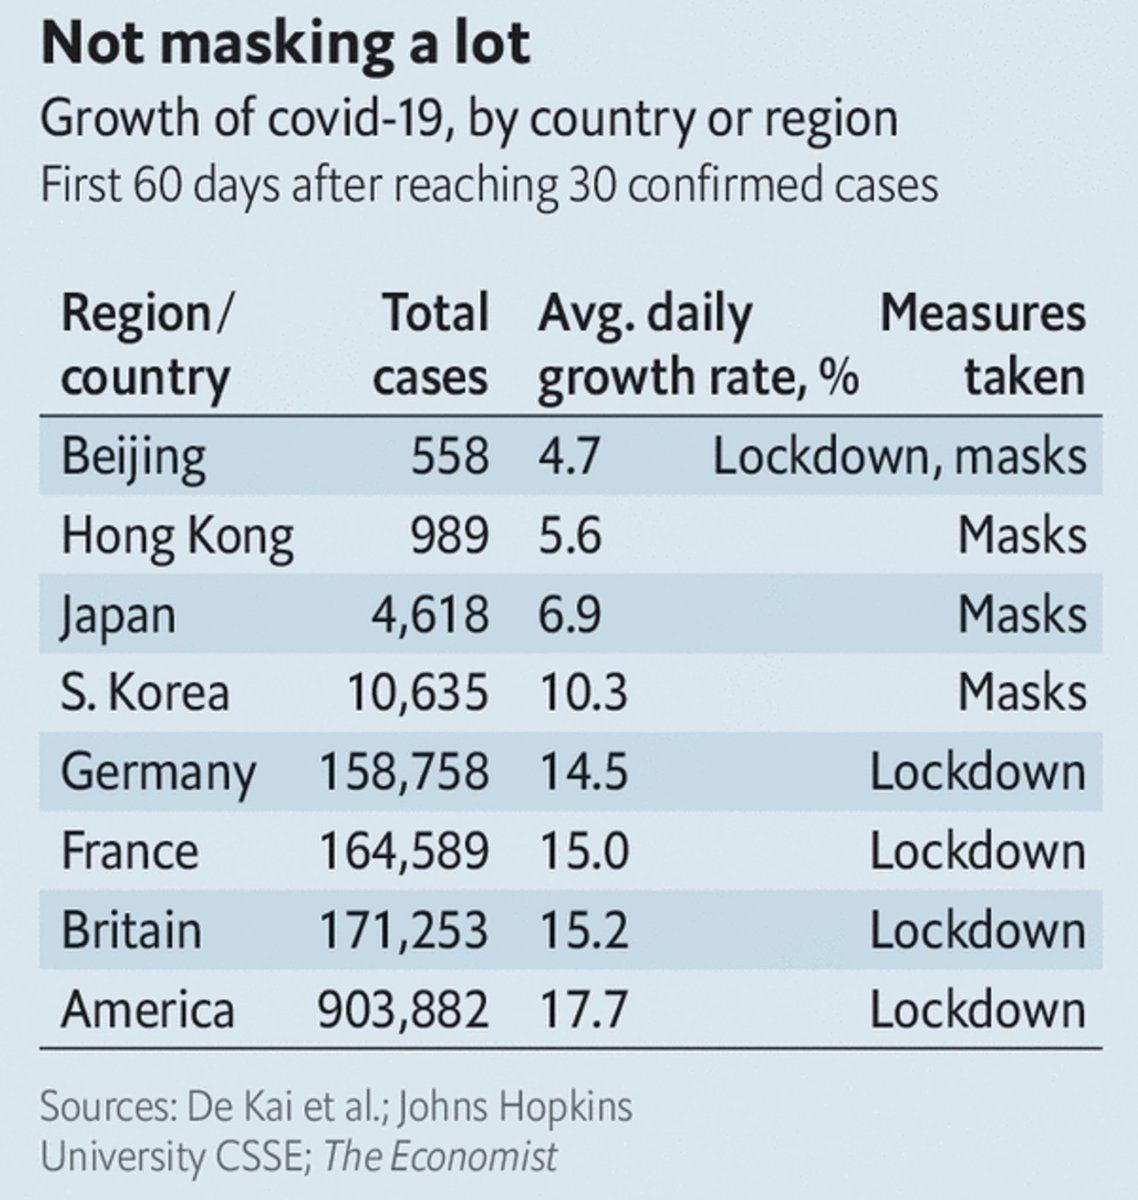 Jadi milih lockdown atau wajib masker? https://t.co/cNbP5SSam3